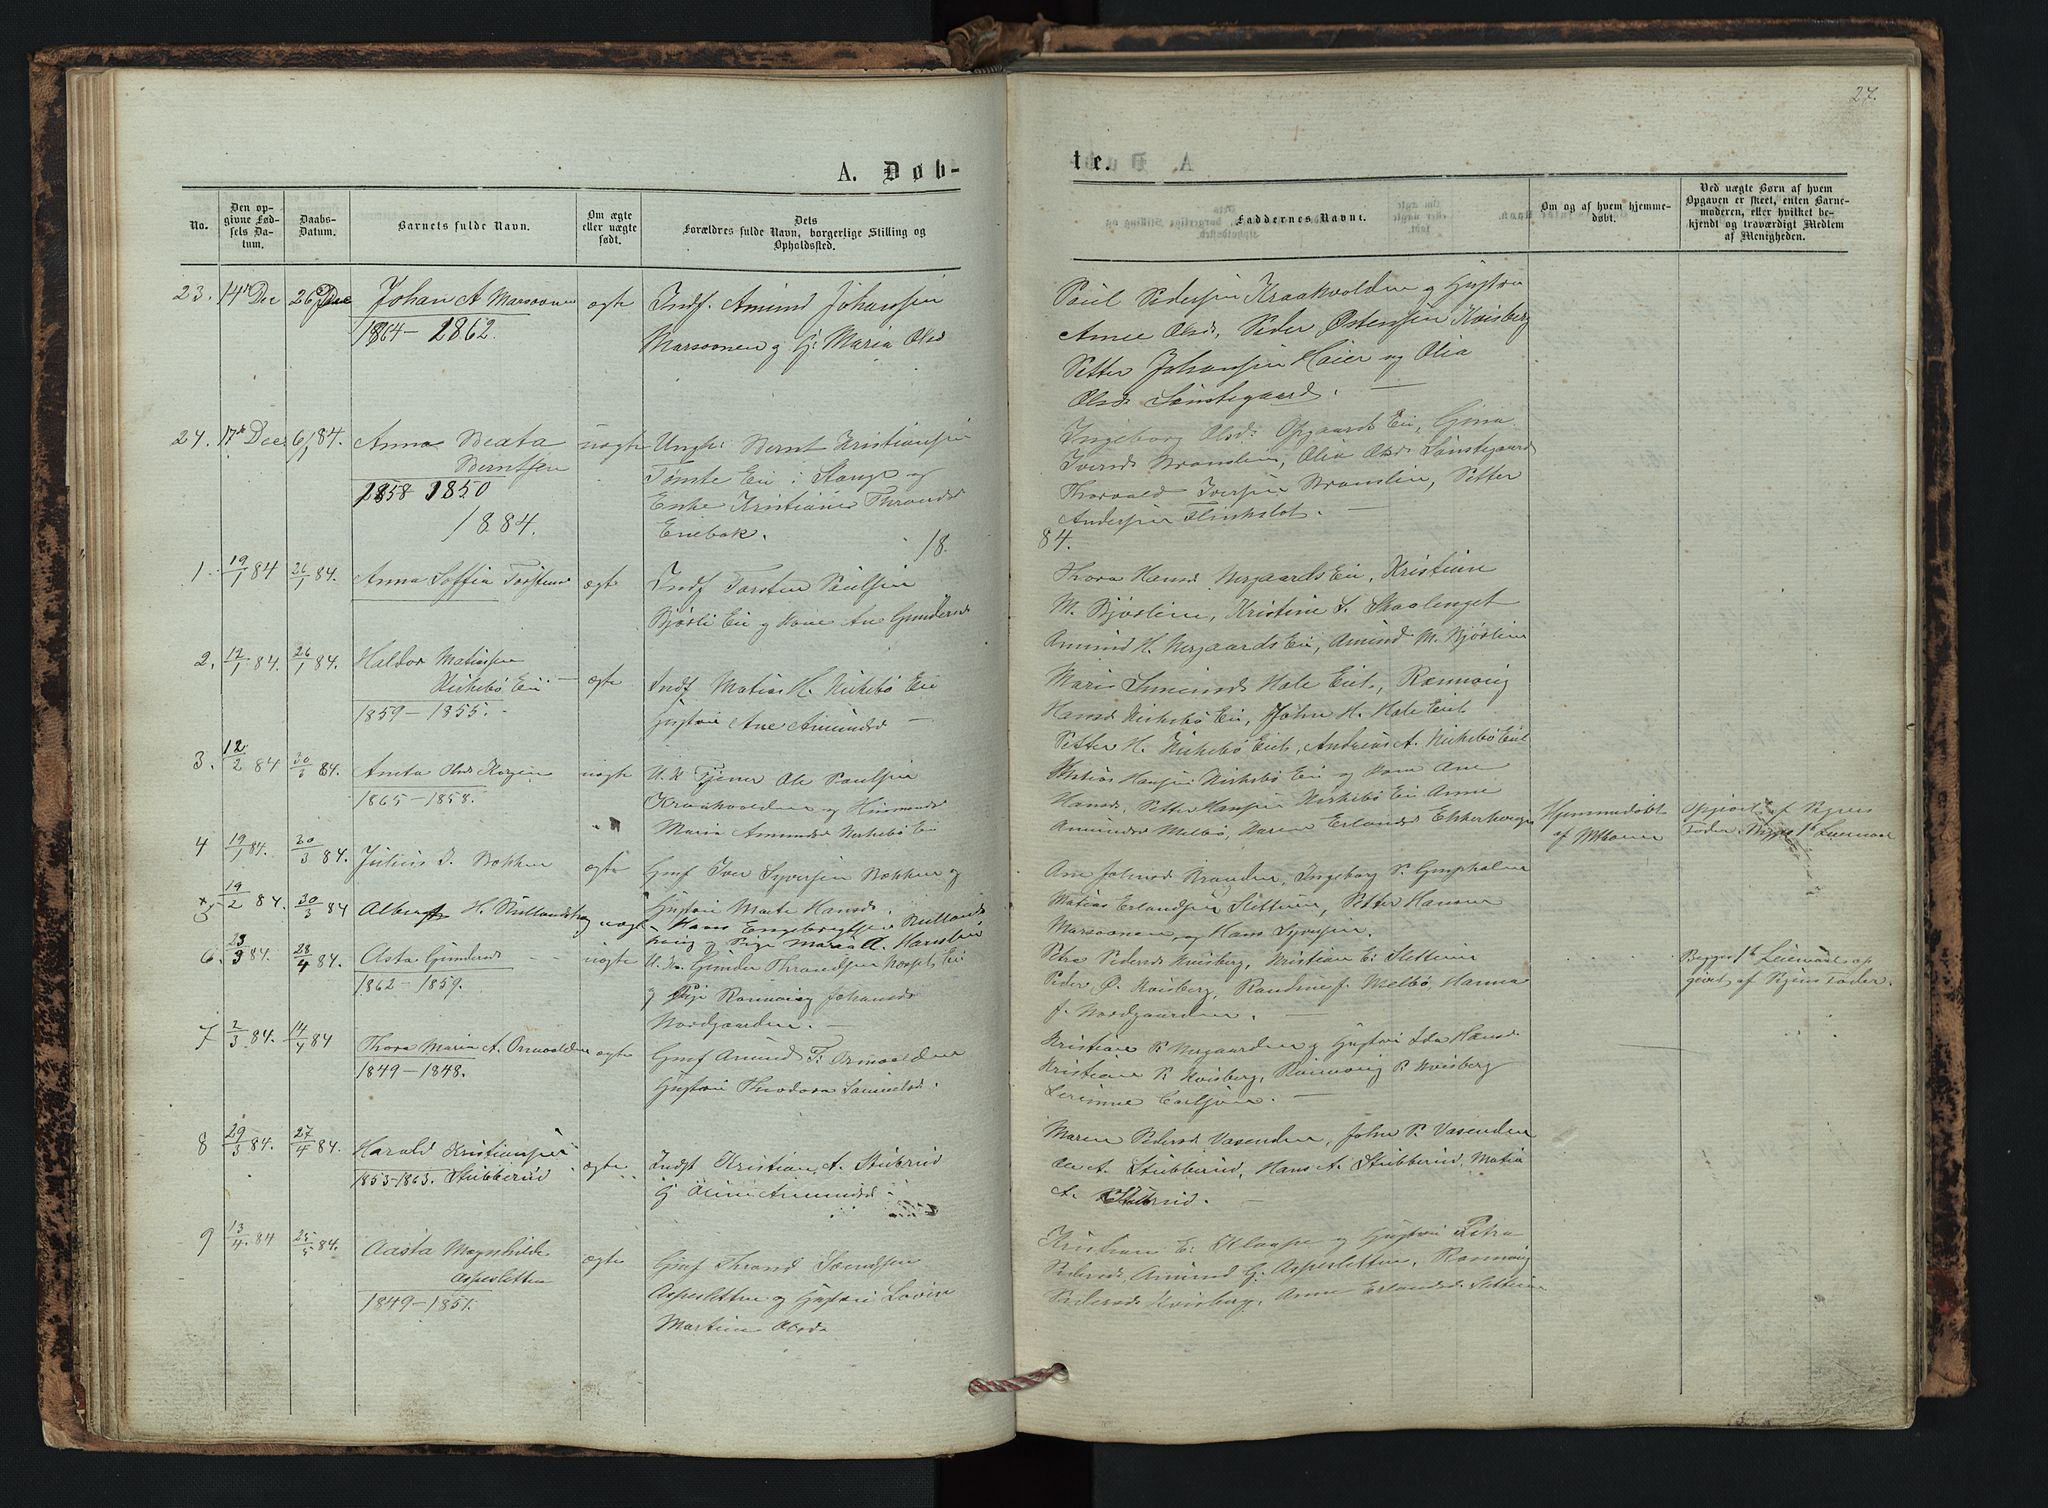 SAH, Vestre Gausdal prestekontor, Klokkerbok nr. 2, 1874-1897, s. 27